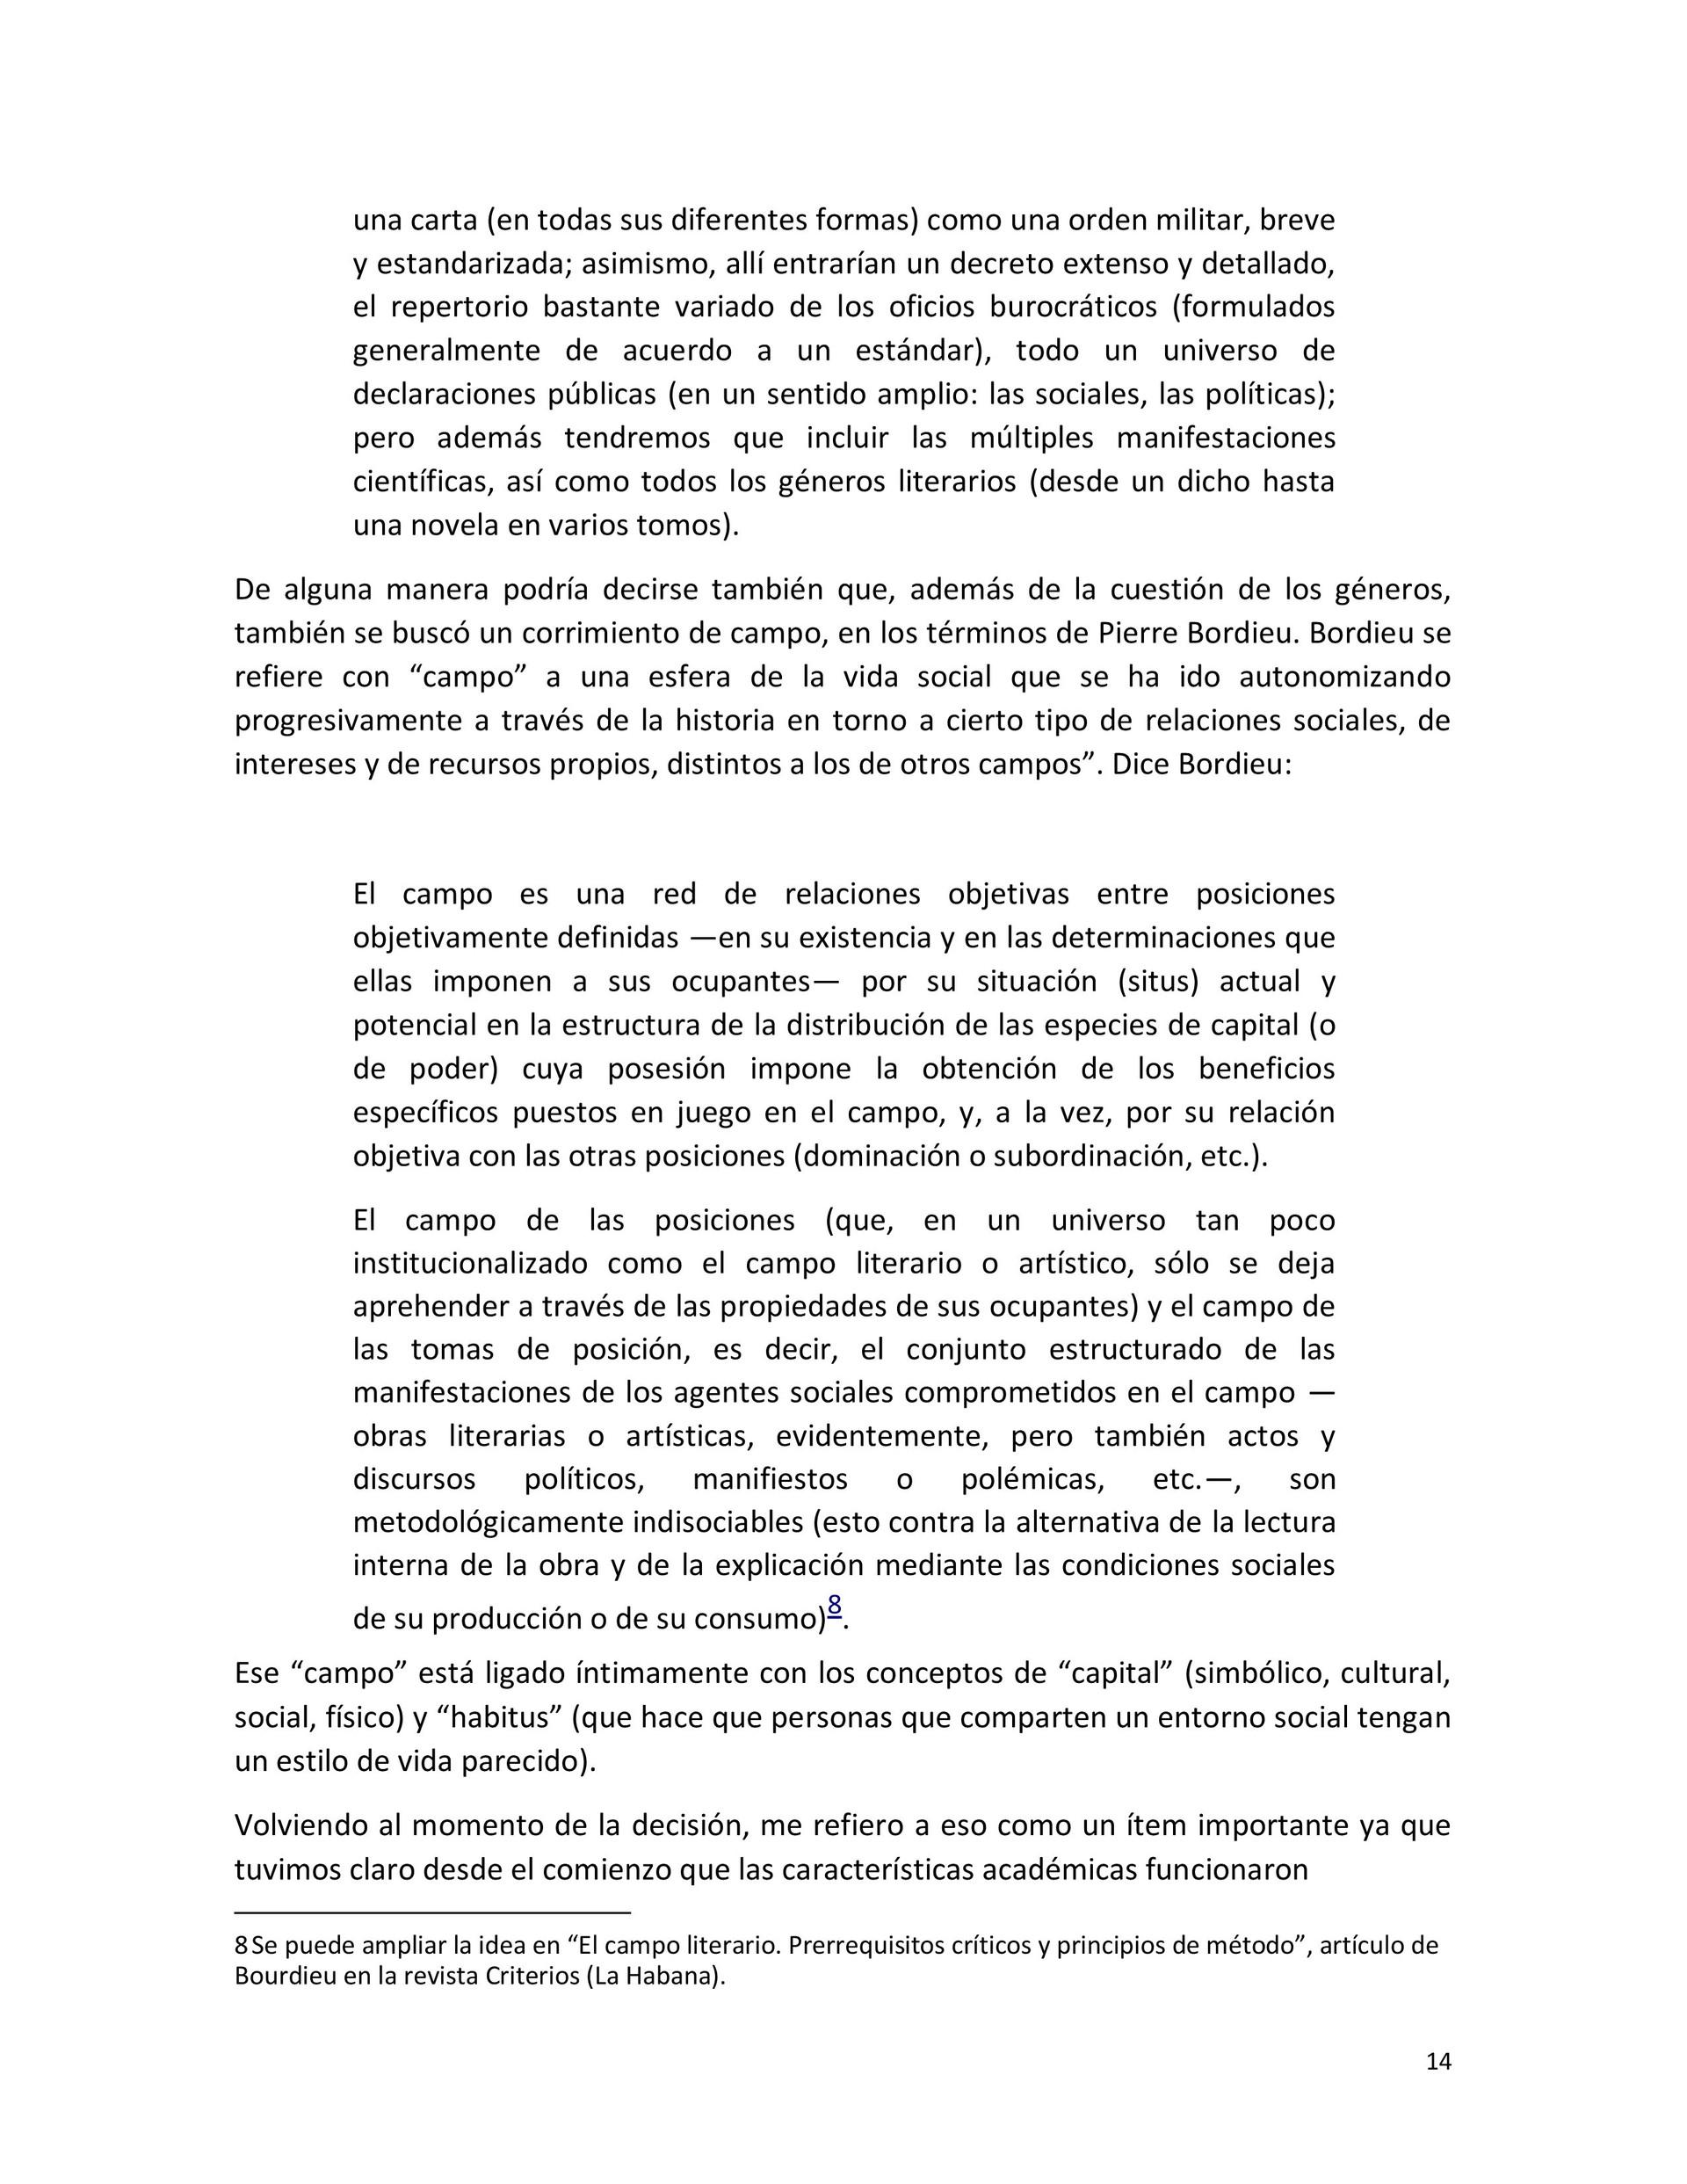 estacion_Page_13.jpeg